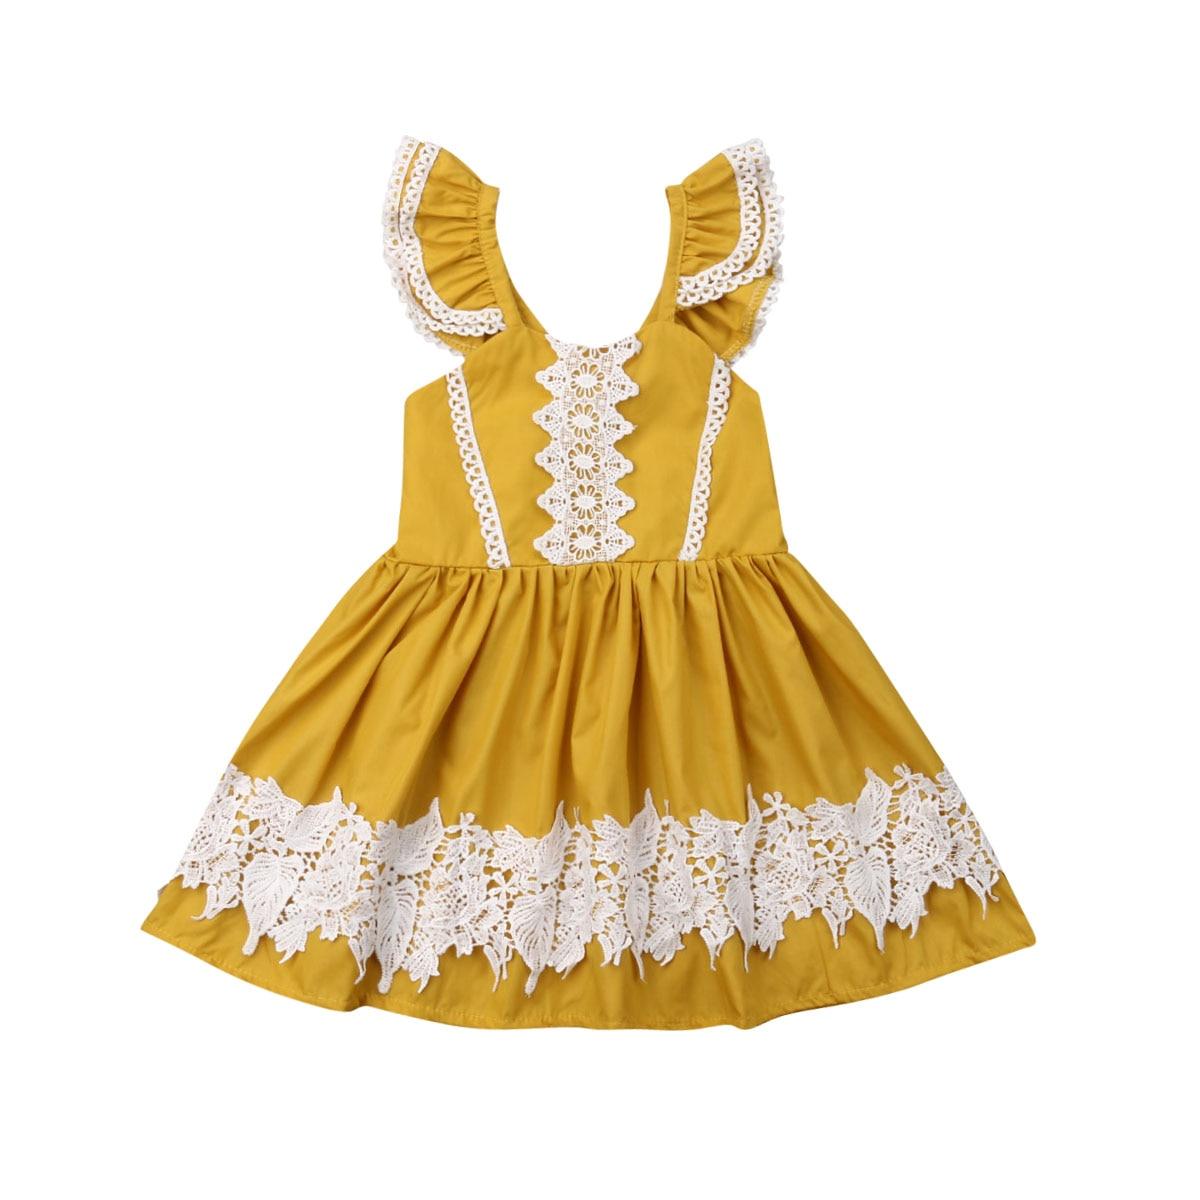 Fashion Toddler Kid Girl Dress Floral Ruffle Tutu Princess Dress Prom Party Beauty Contest Formal Dress